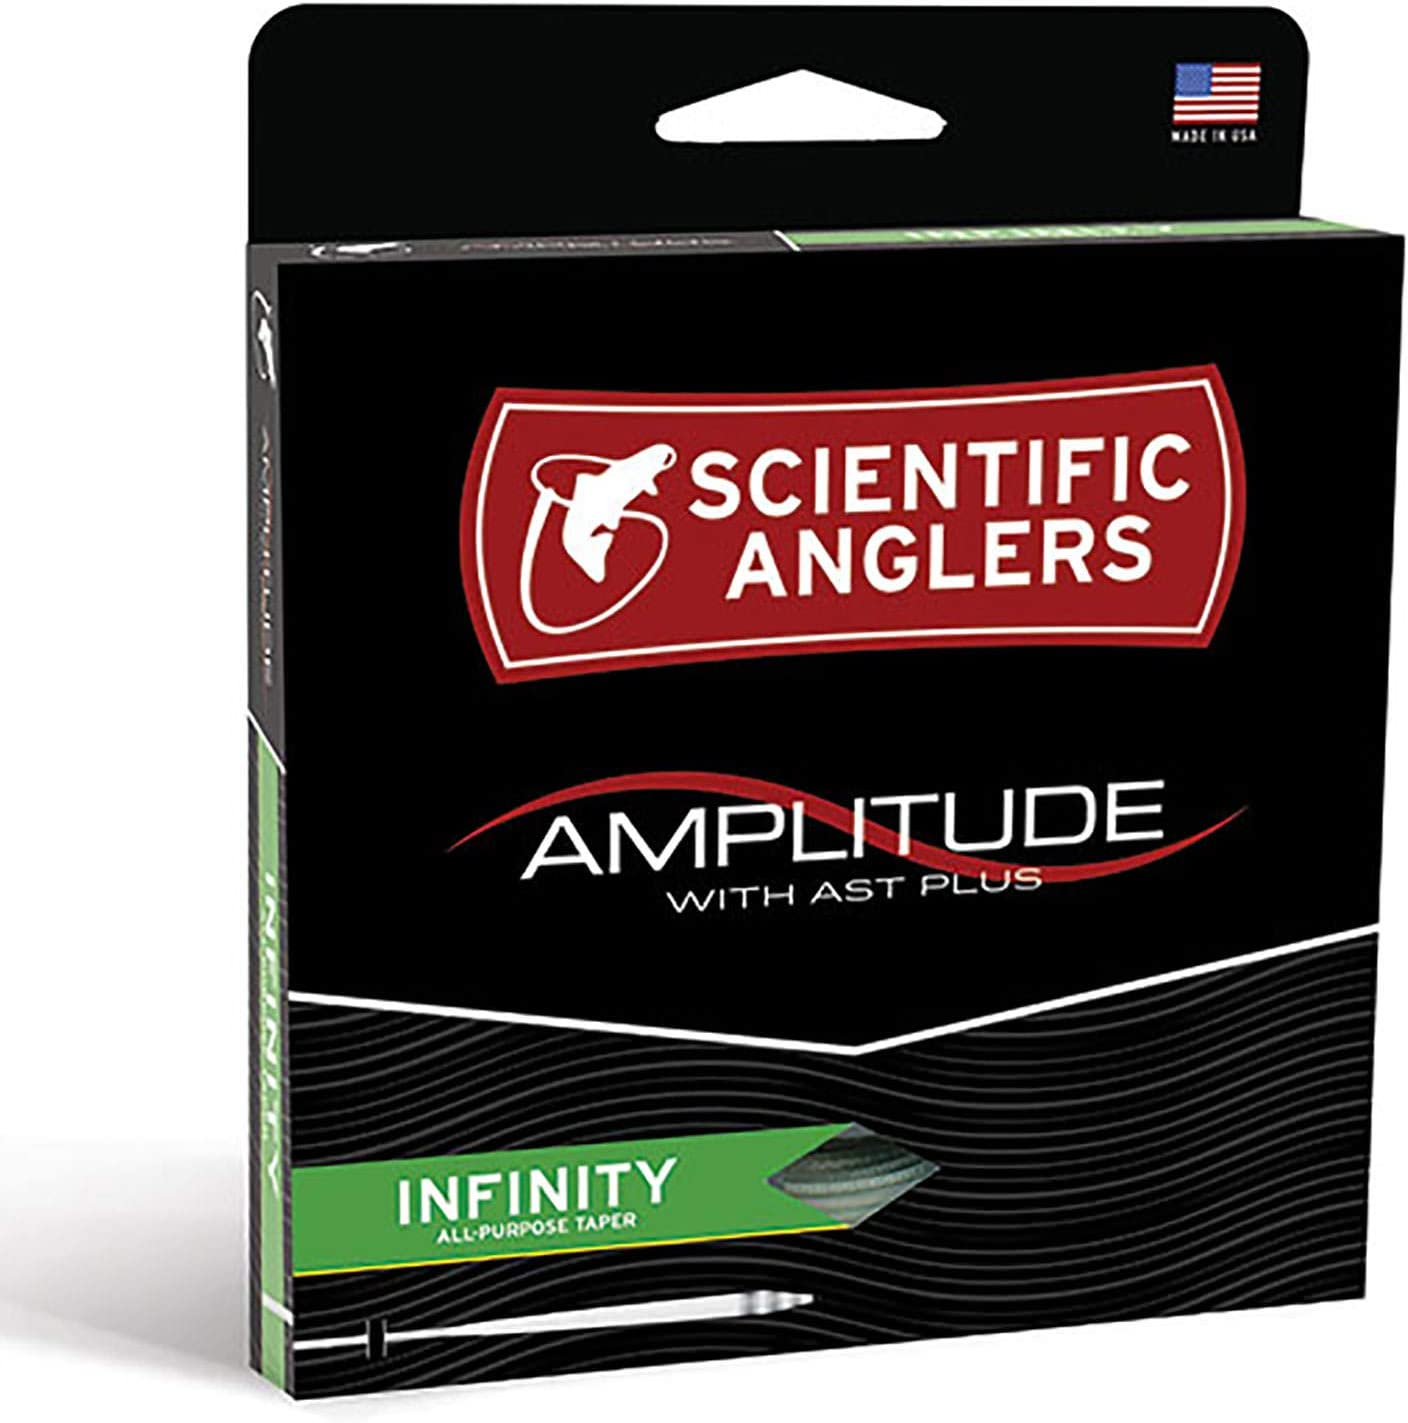 Scientific Anglers Amplitude Infinity Fly Line